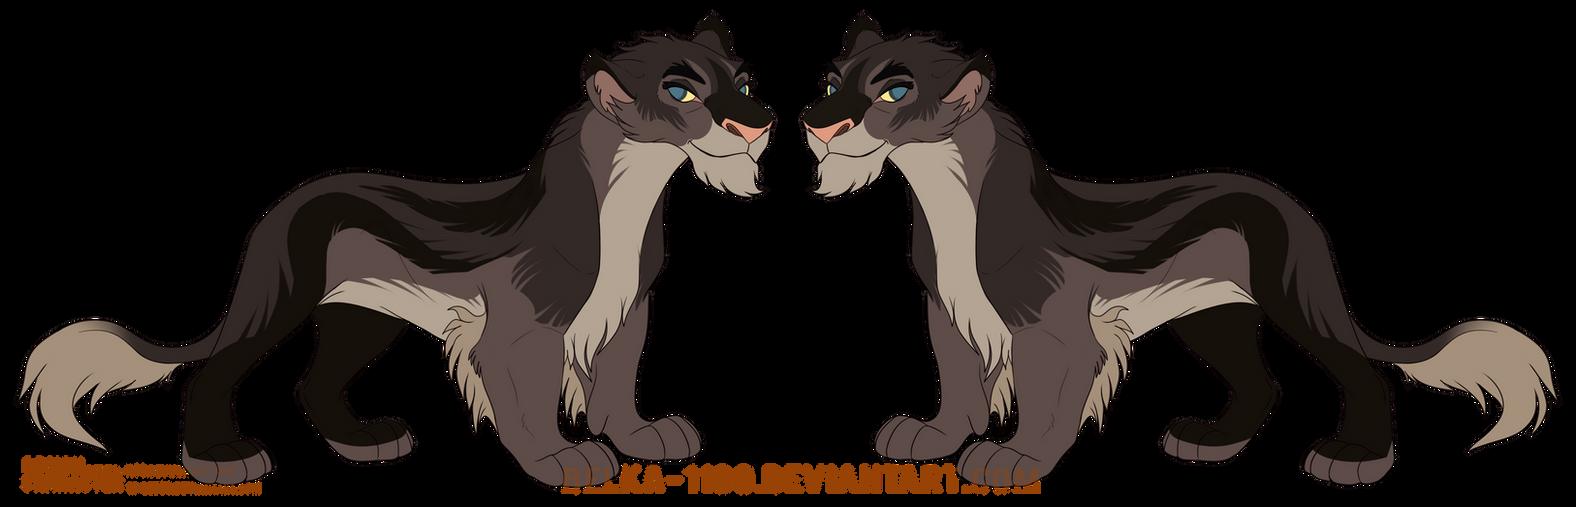 Deviantart Character Design Commission : Characters design commission by belka on deviantart